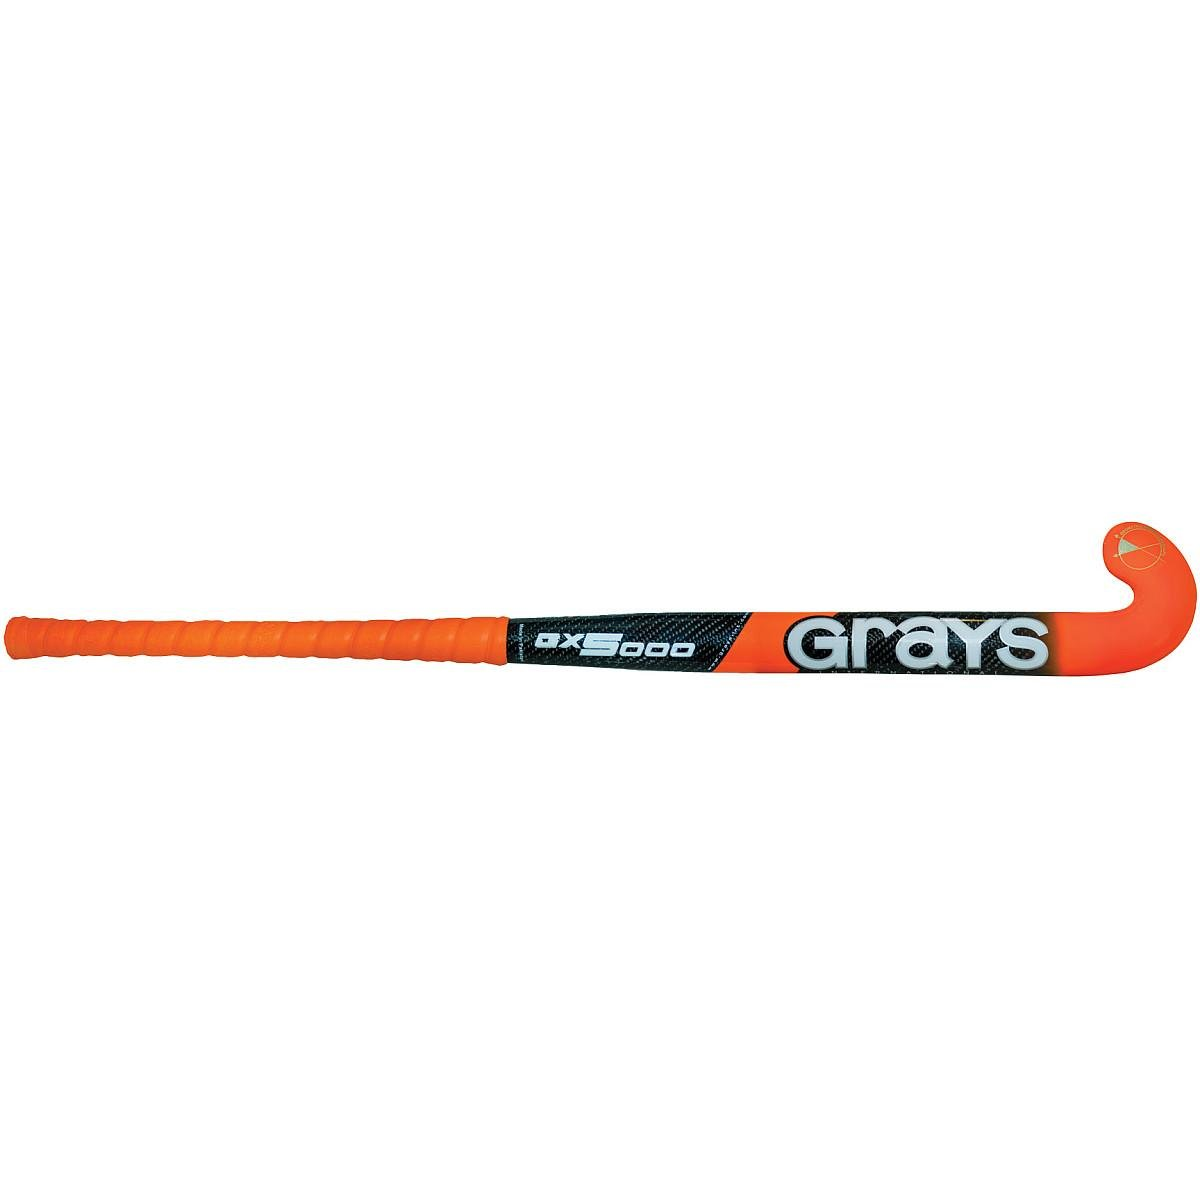 GRAYS GX5000 Composite Field Hockey Stick